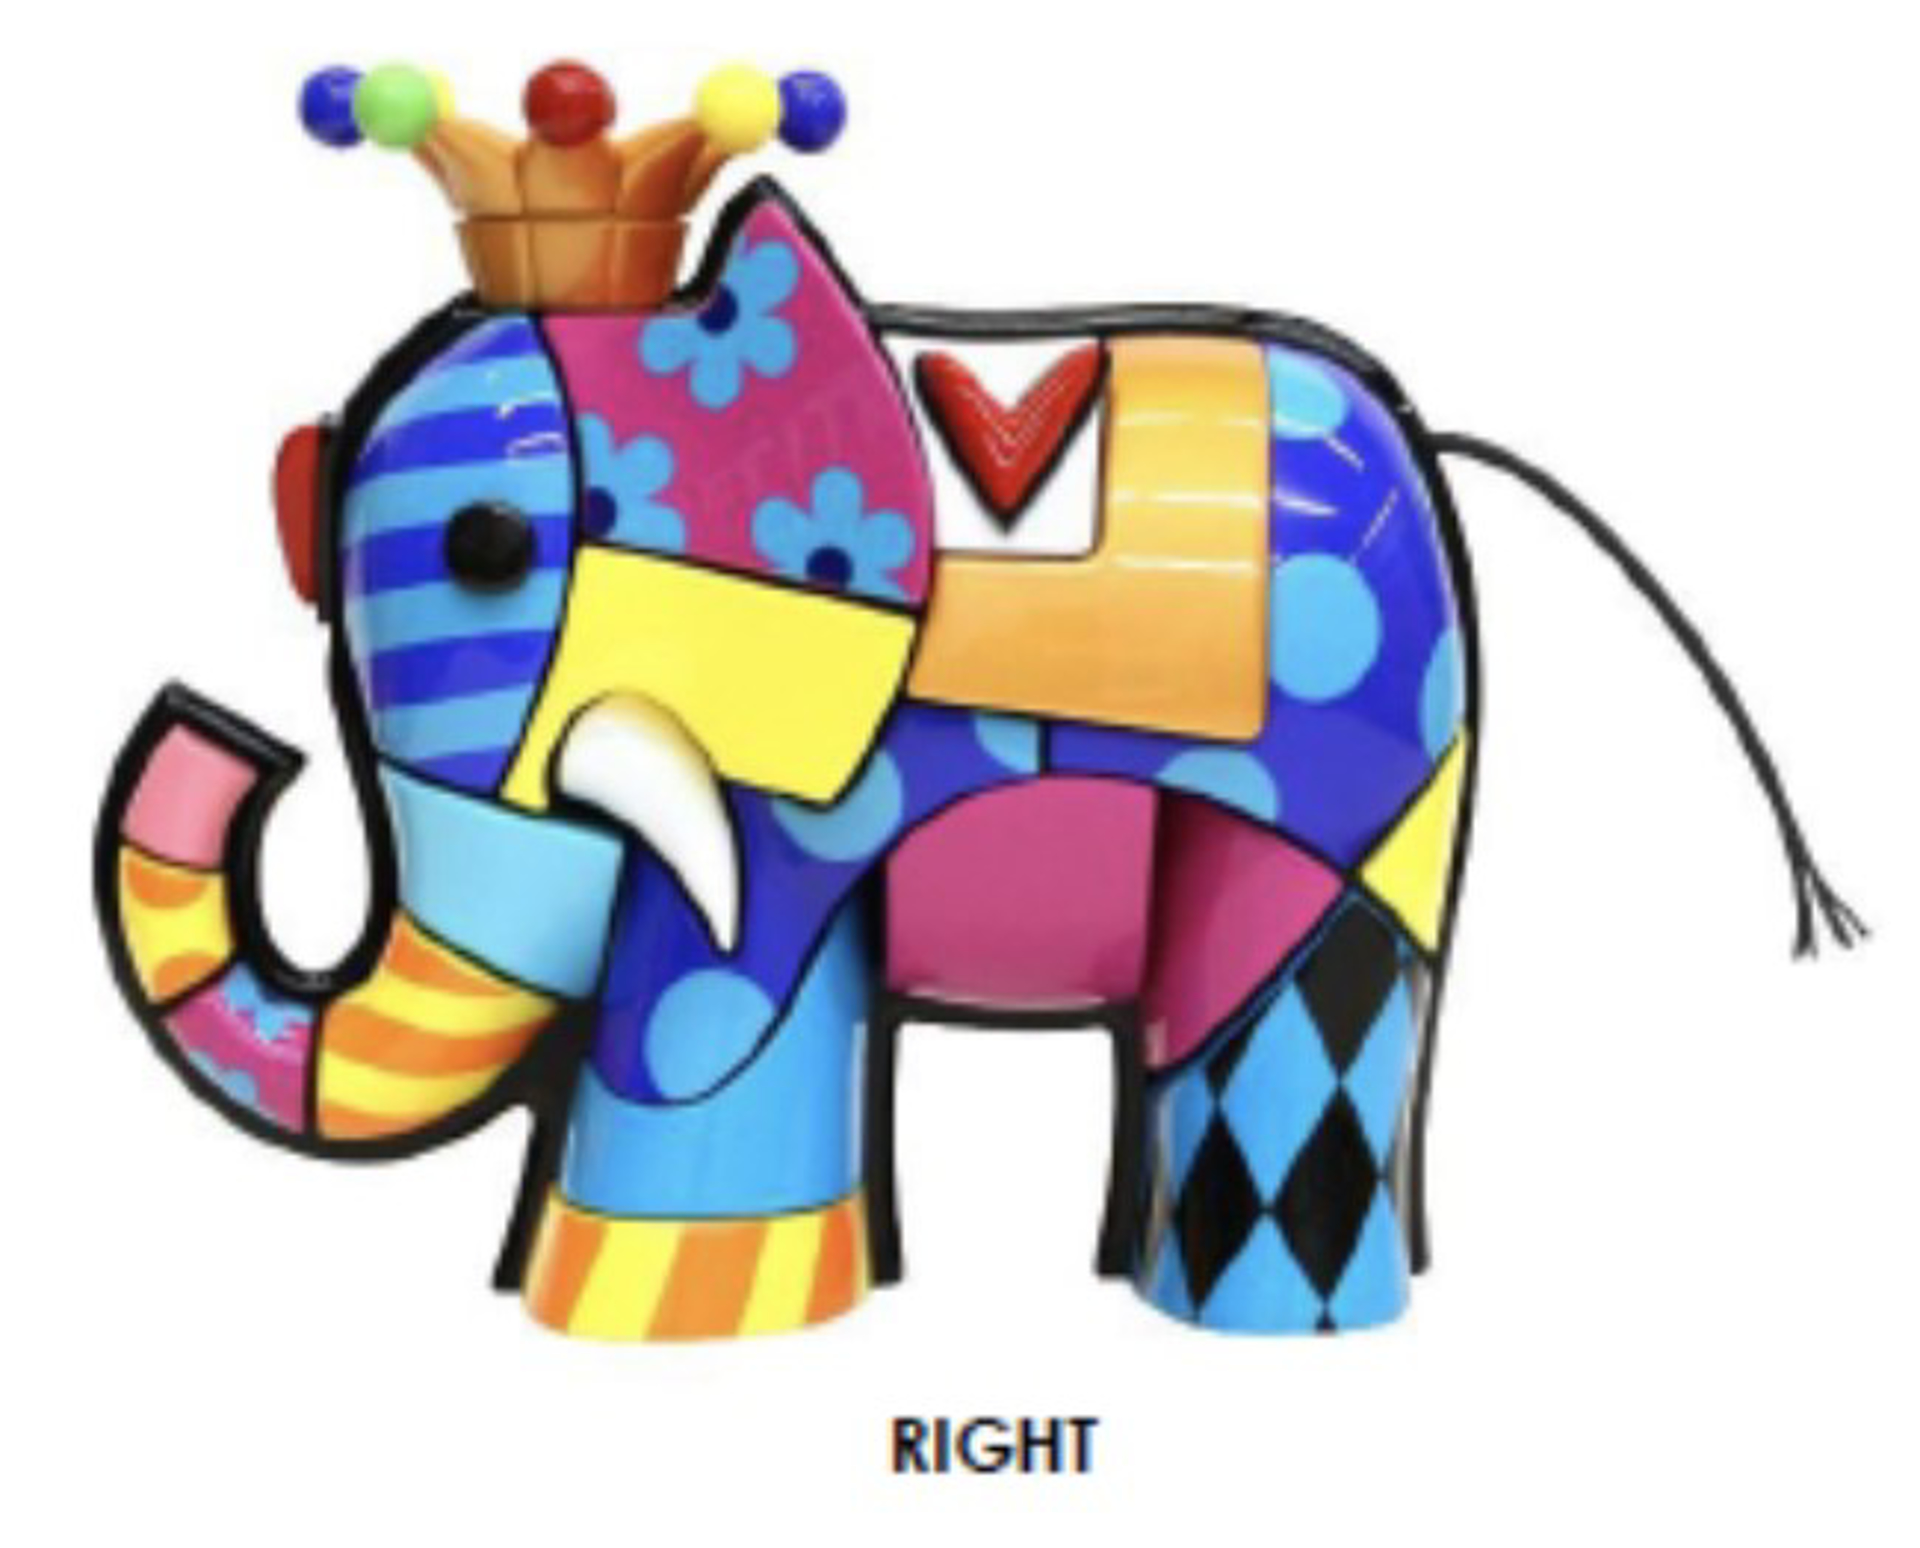 ELEPHANT by Romero Britto